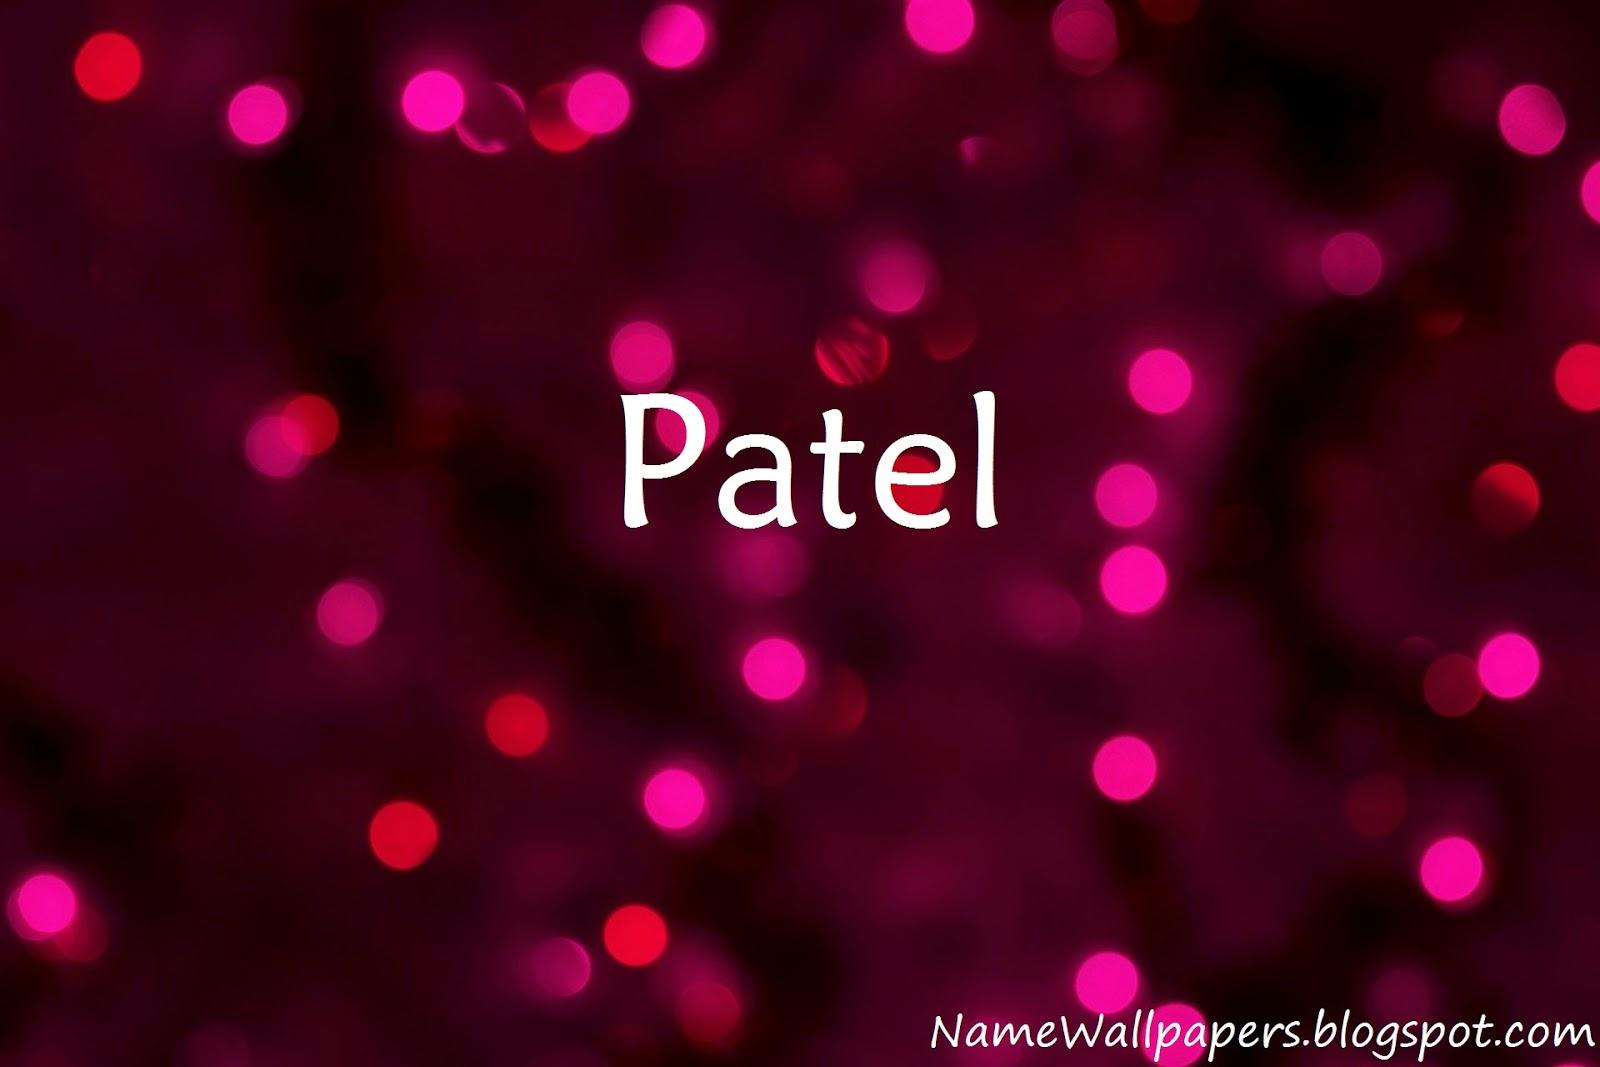 Cute Yoda Wallpaper Download Patel Name Wallpaper Gallery